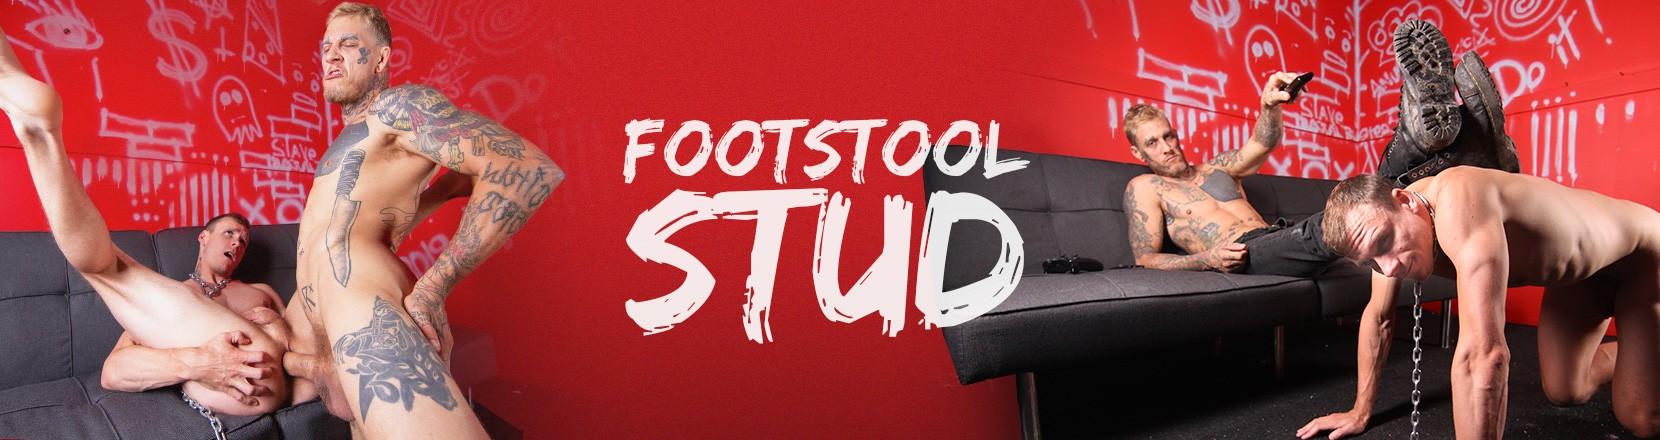 Bromo Footstool Stud Featuring Bo Sinn and Windom Gold